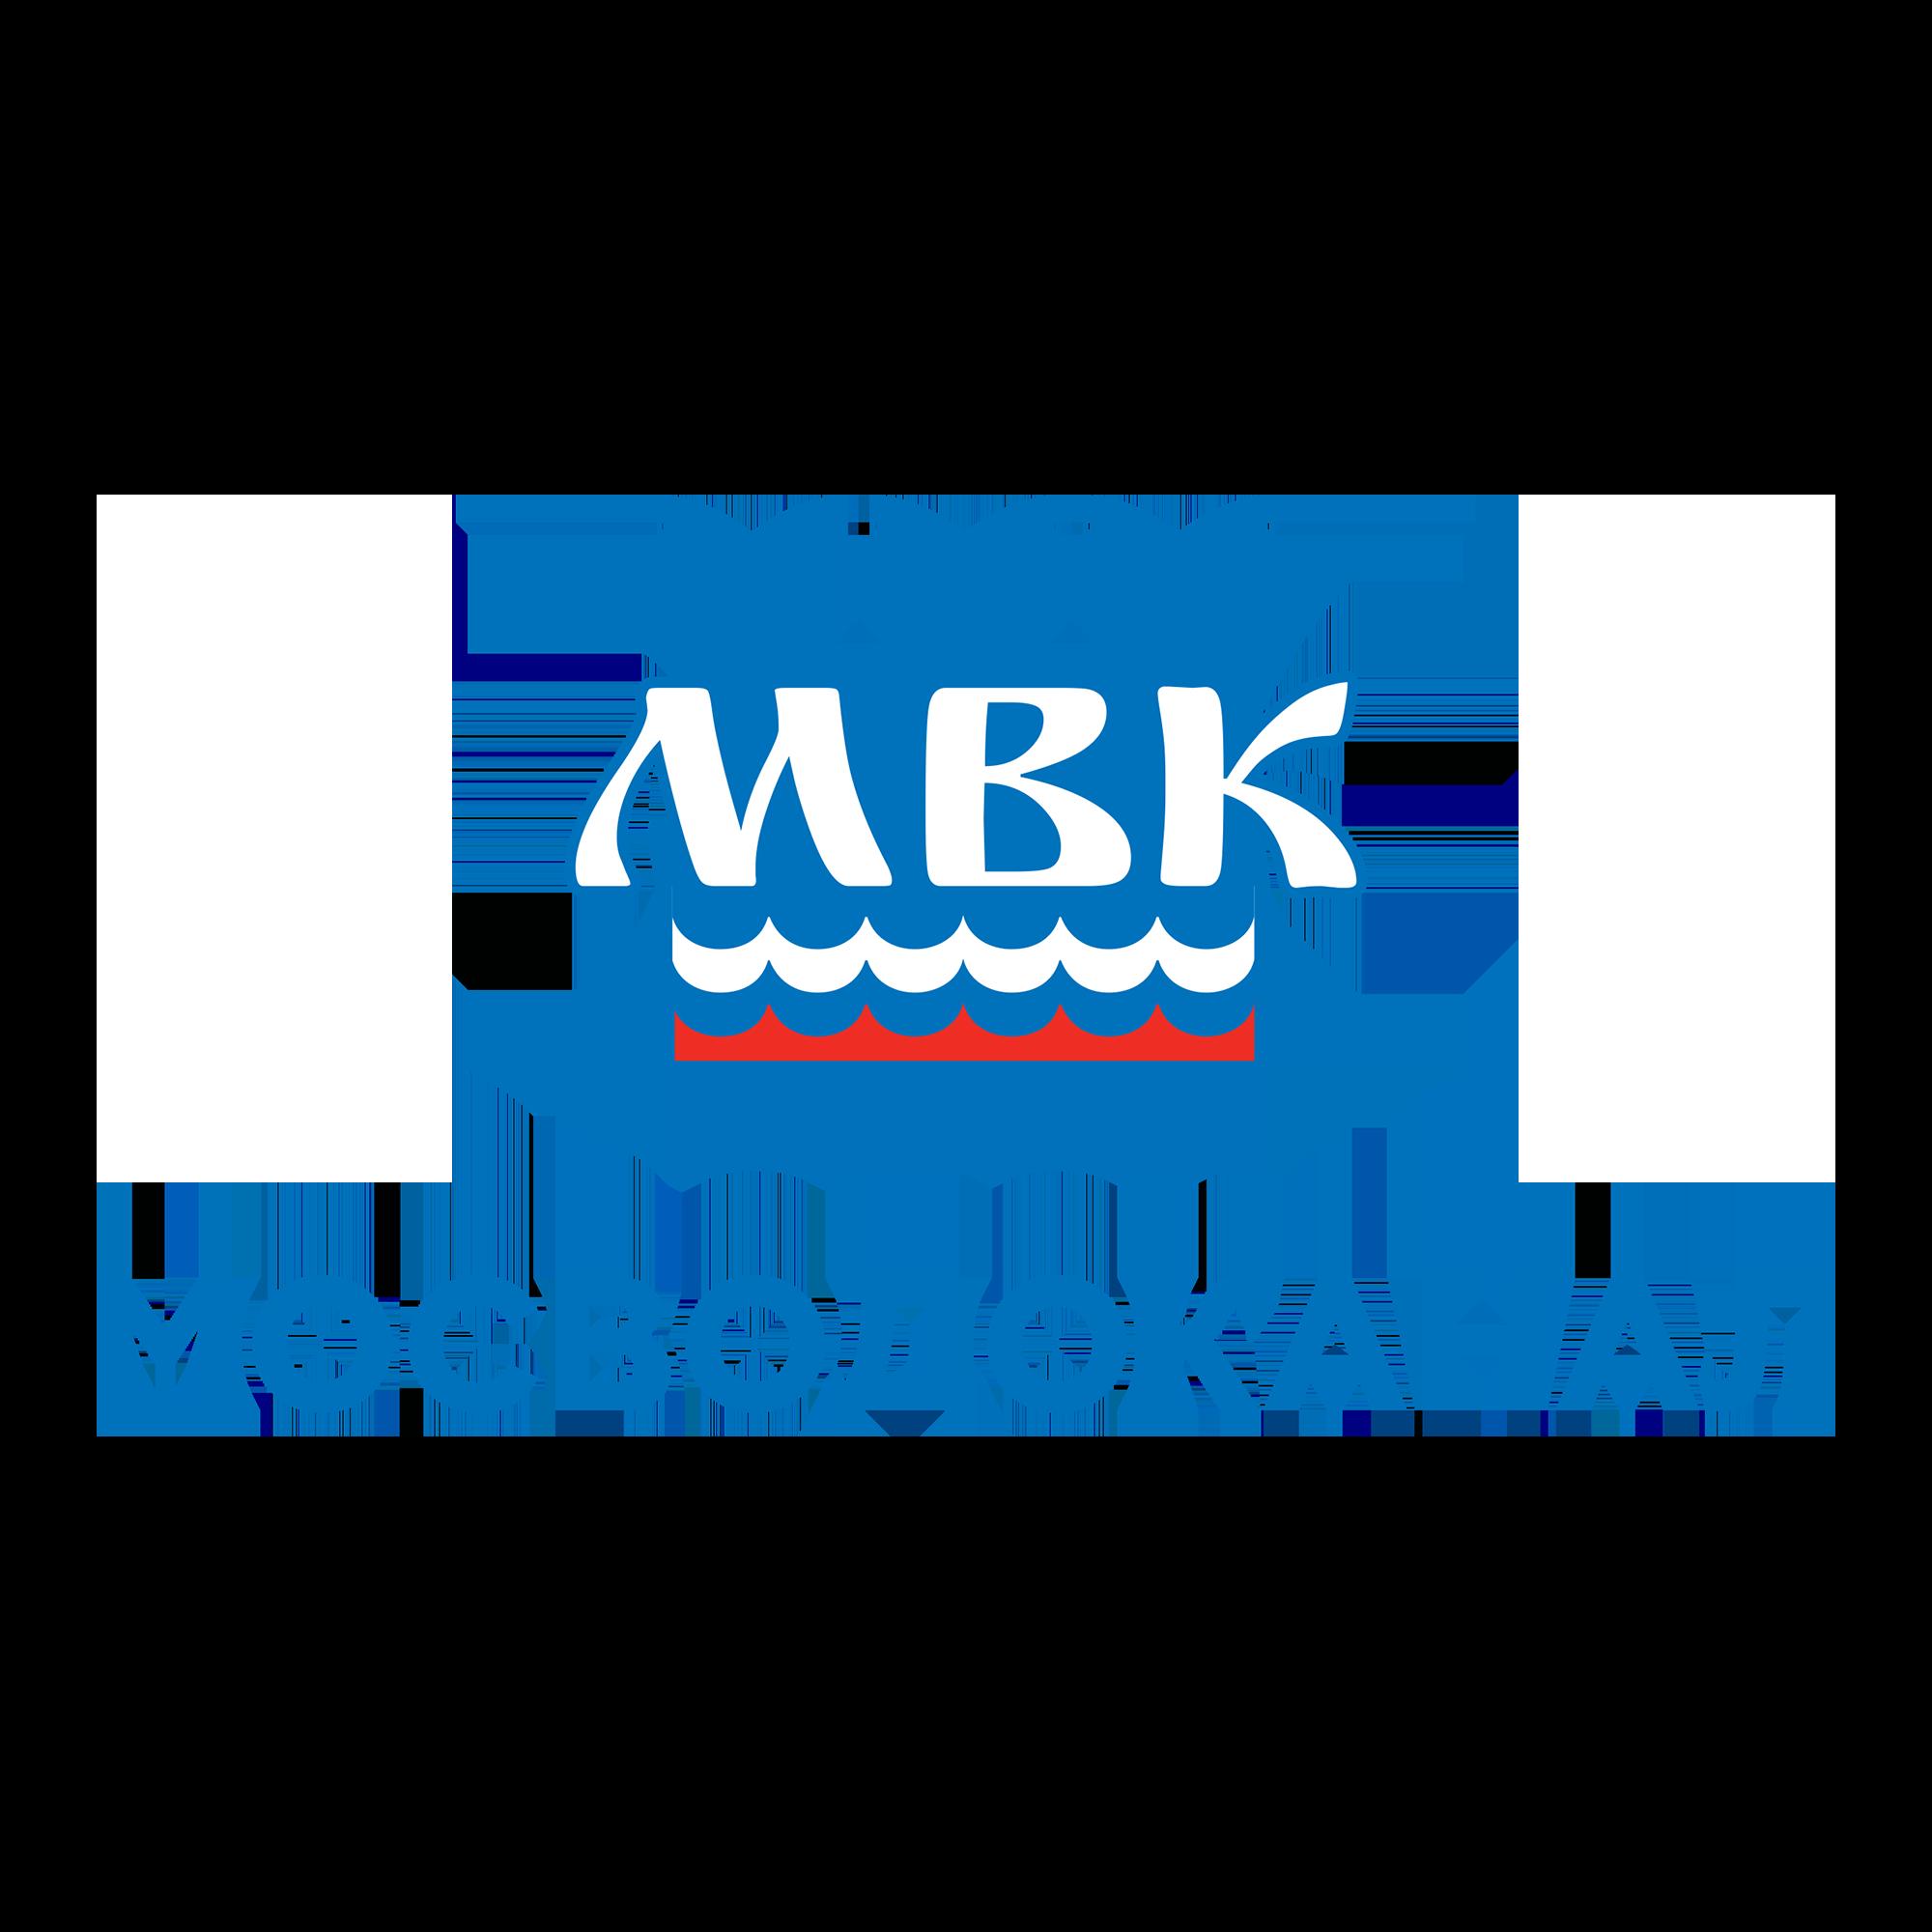 z_mosvodokanal